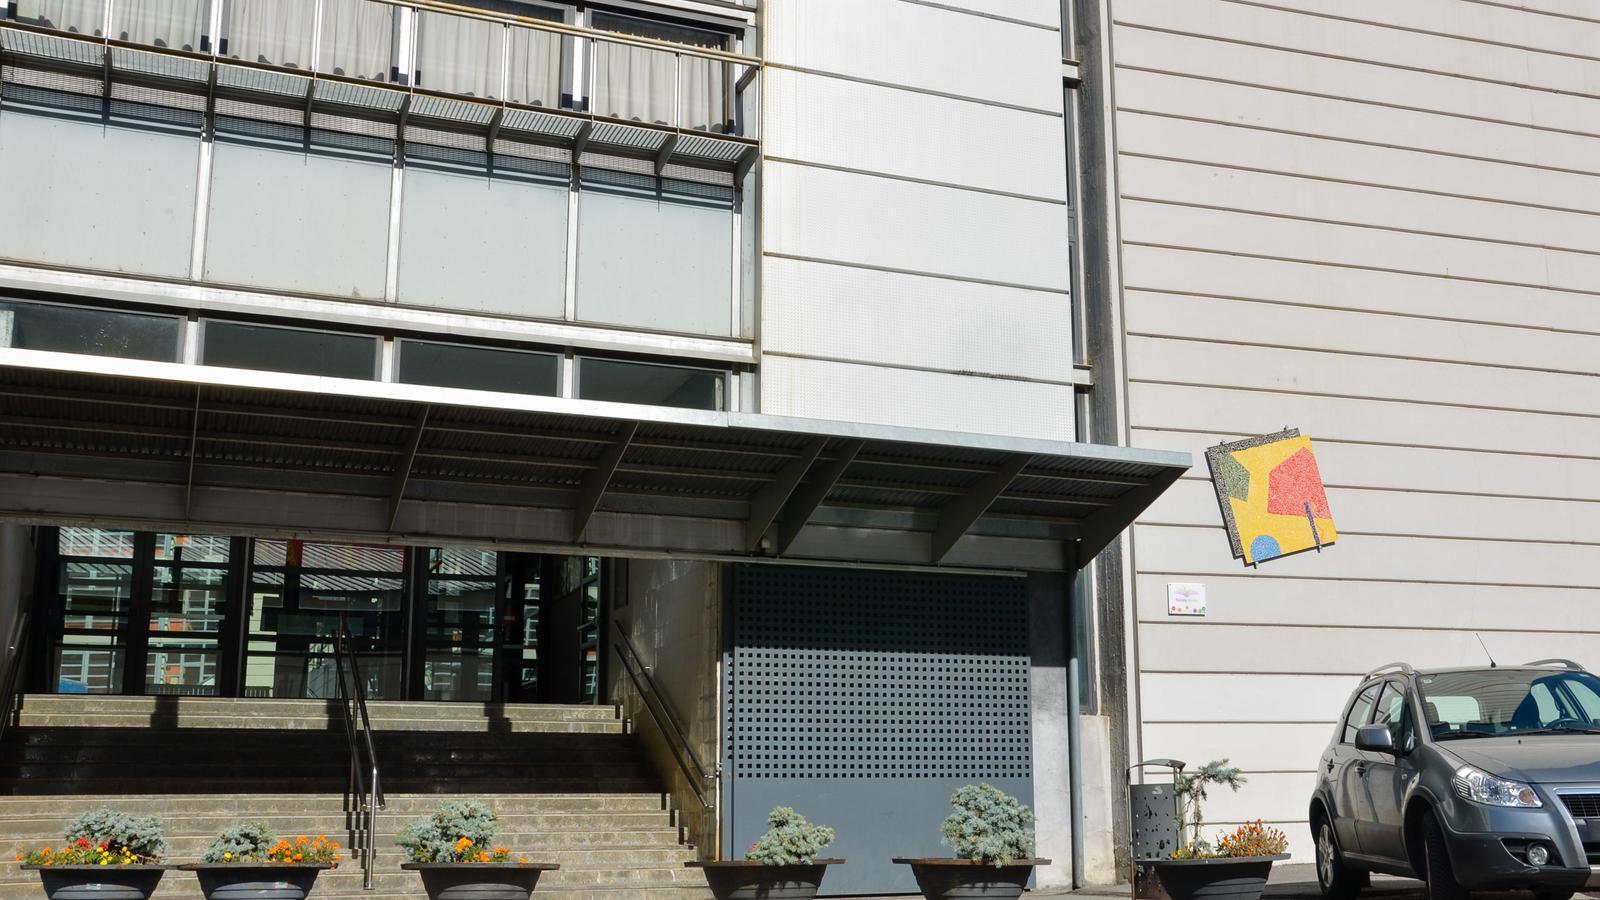 Edifici de l'escola andorrana de Santa Coloma. / ARXIU (ANA)